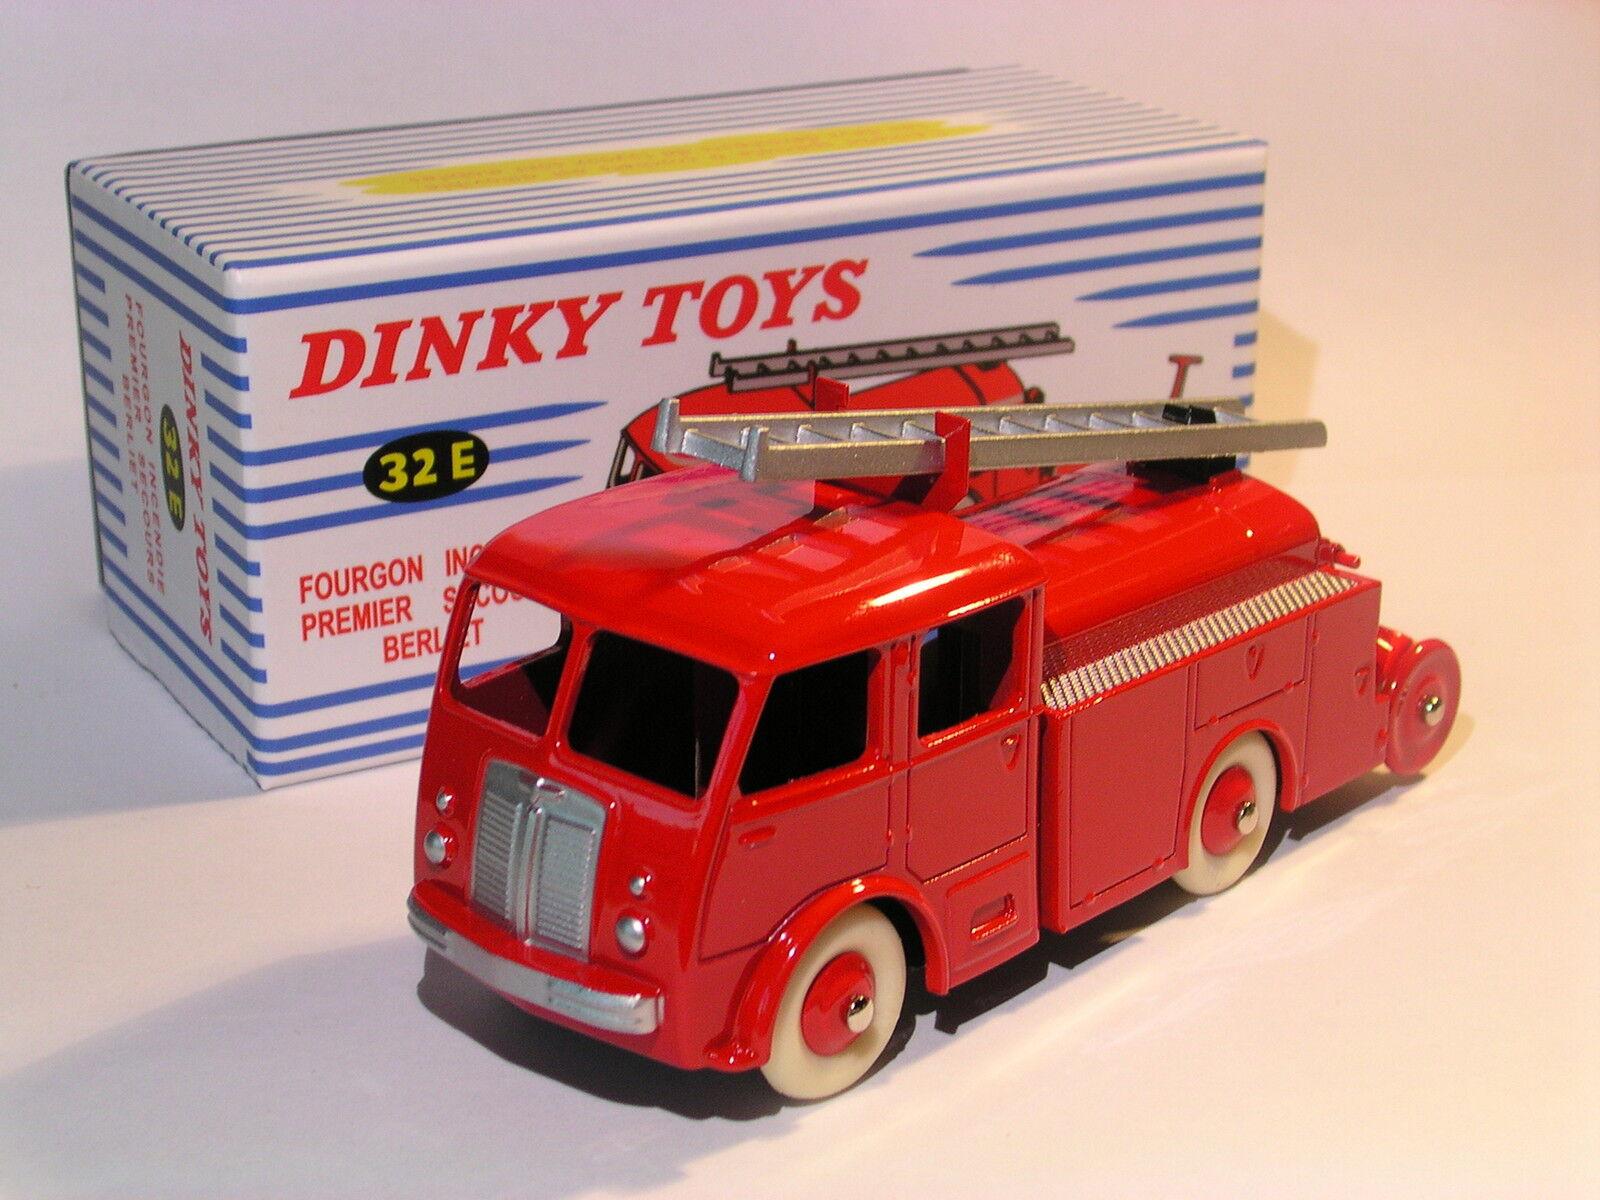 Van Wagon Fire First Aid Berliet Fire - Ref 32 E of Dinky Toys Atlas